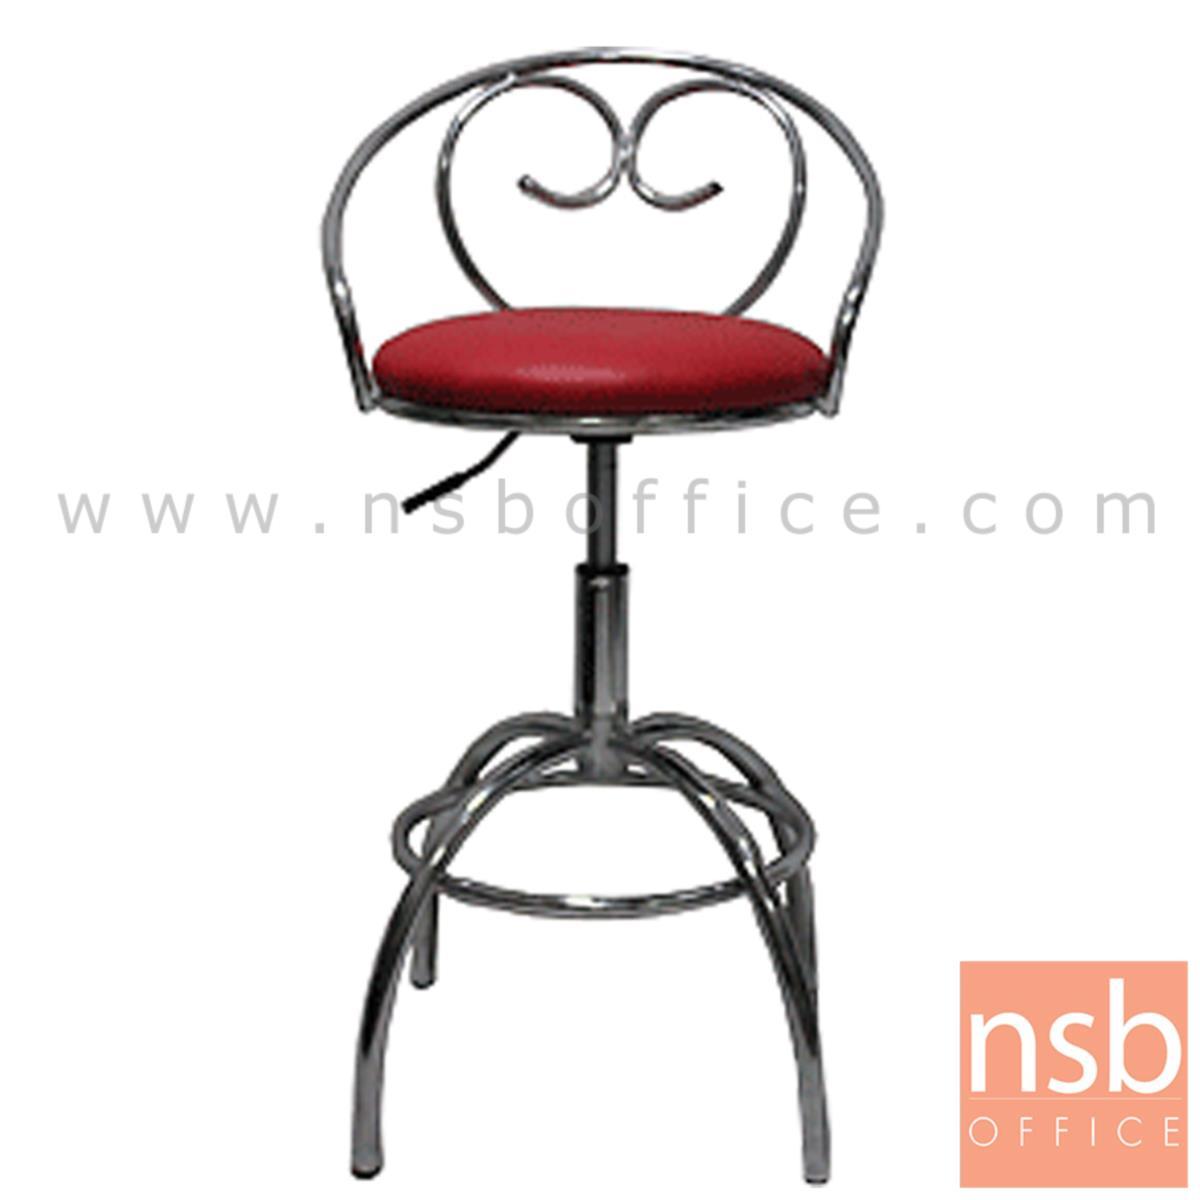 B09A107:เก้าอี้บาร์สตูลที่นั่งกลม รุ่น Olinda (โอลินดา)  โช๊คแก๊ส ขาเหล็กชุบโครเมี่ยม